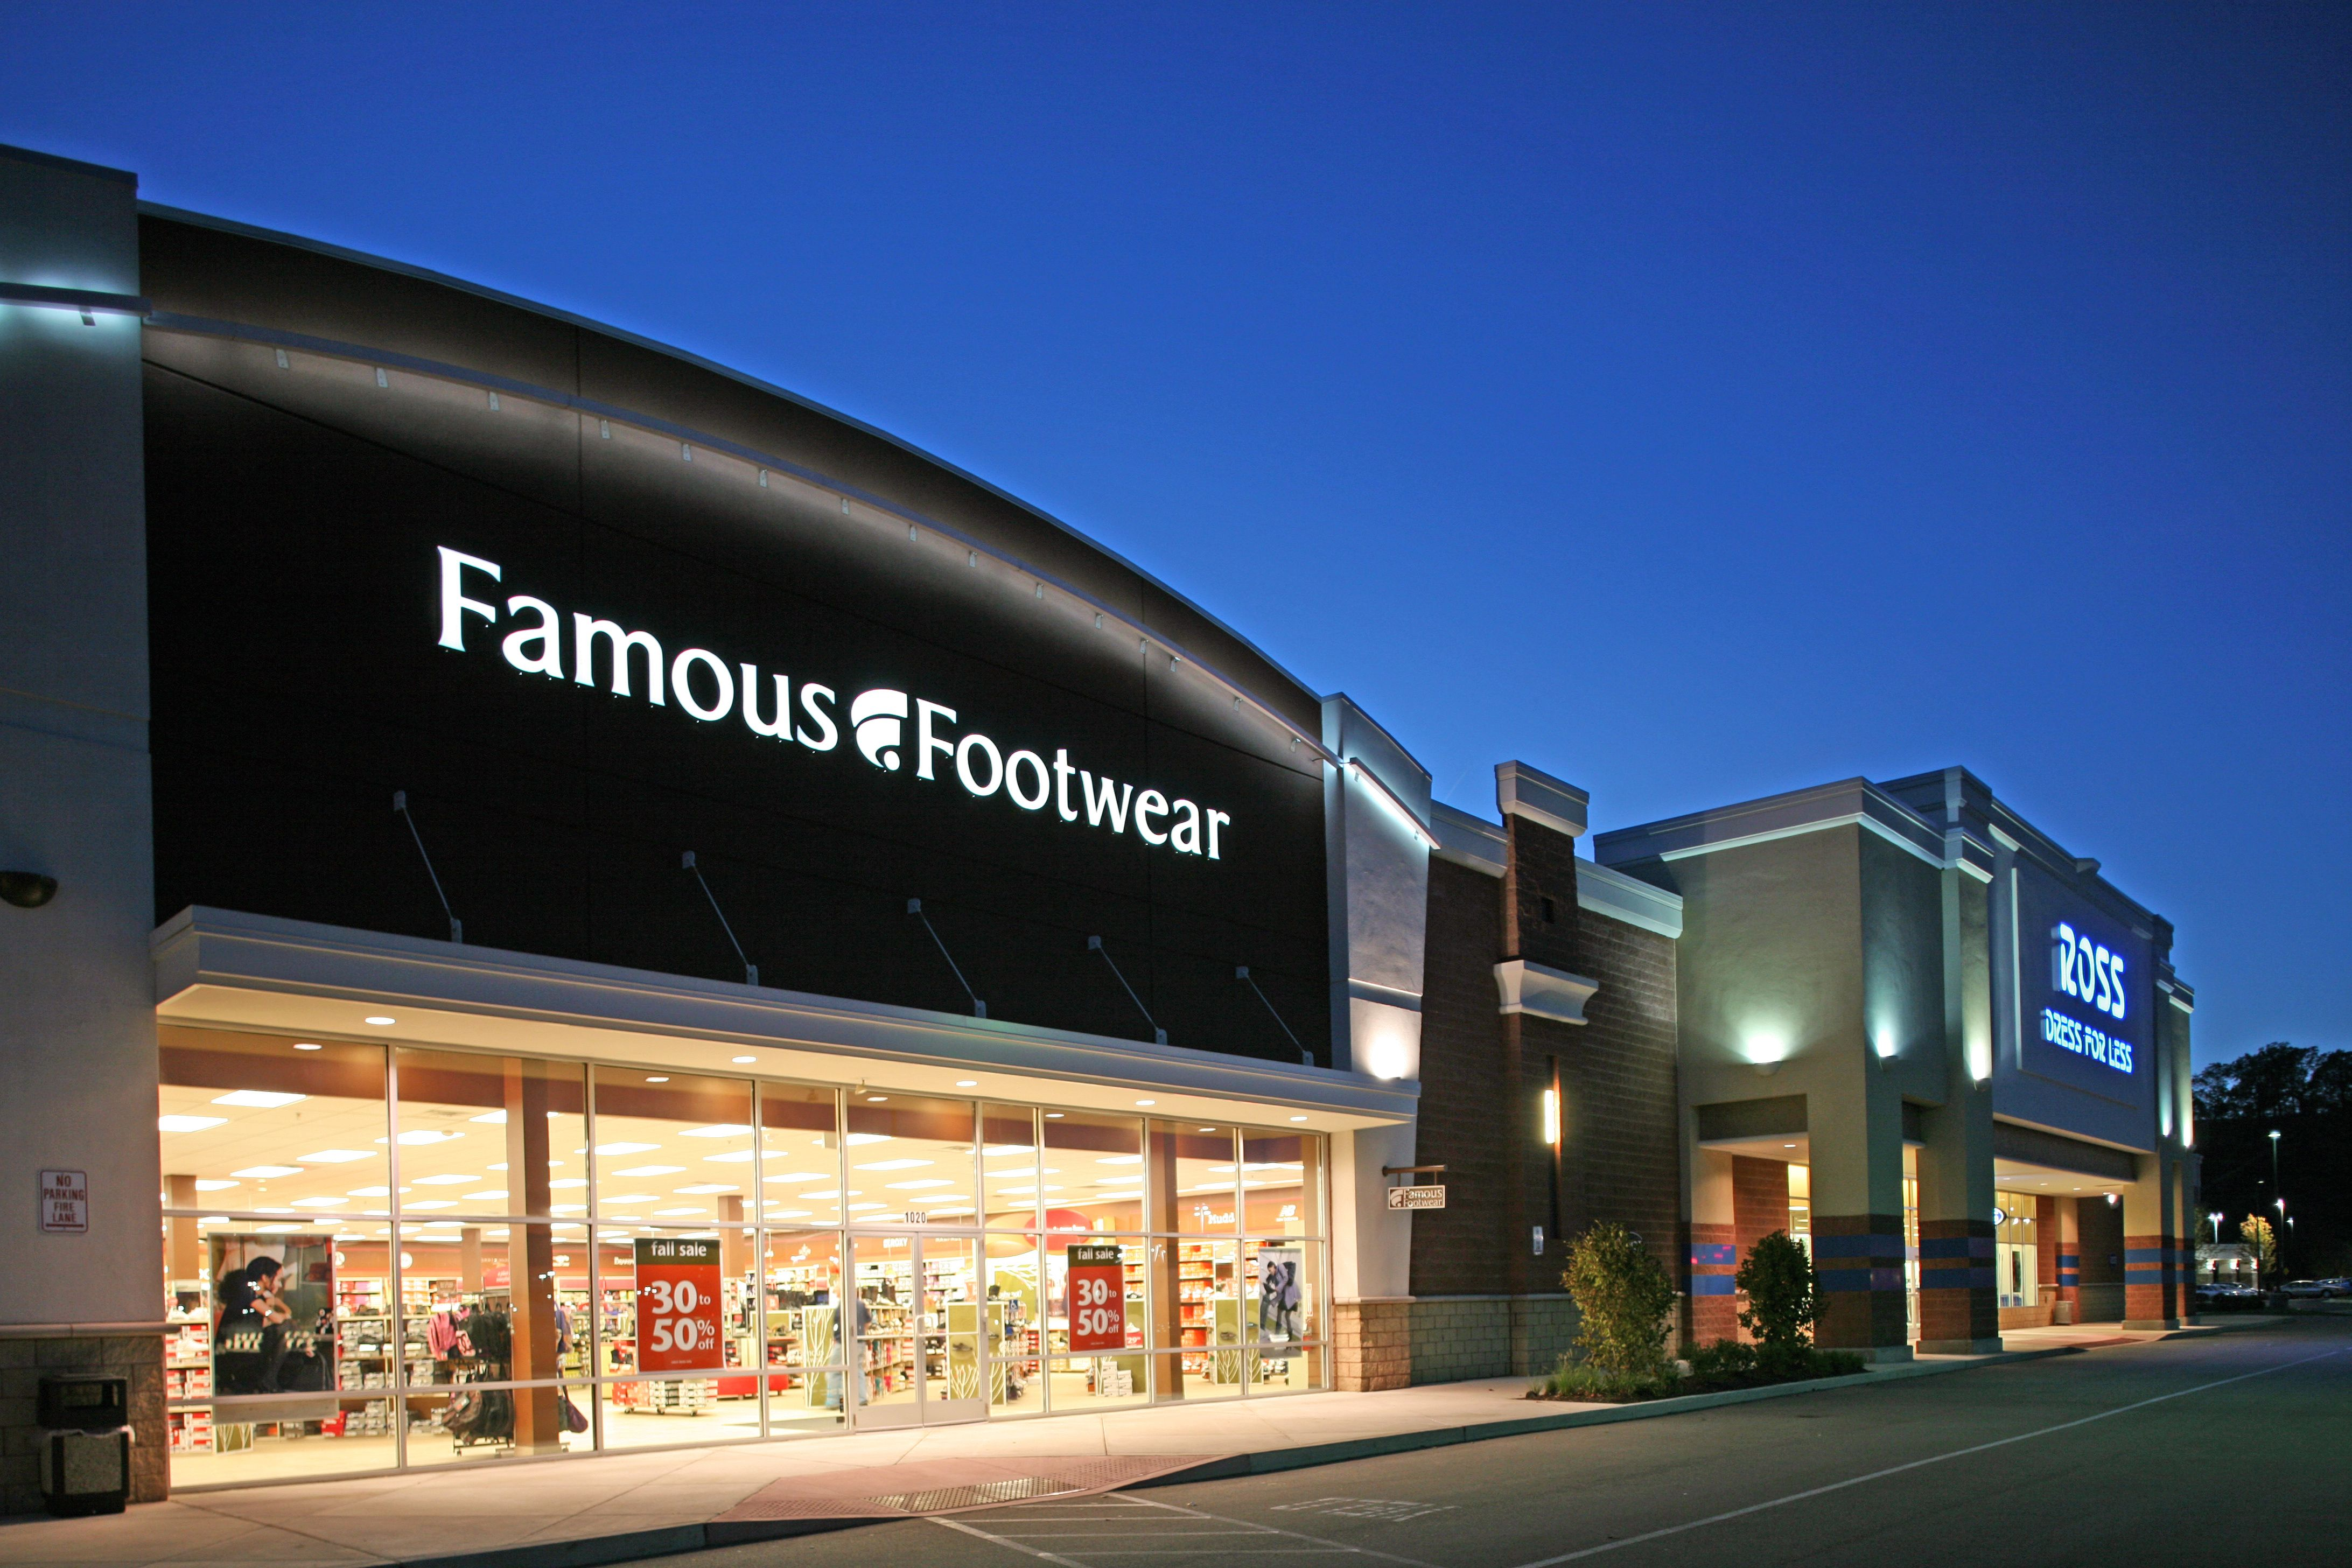 famous footwear exterior shot